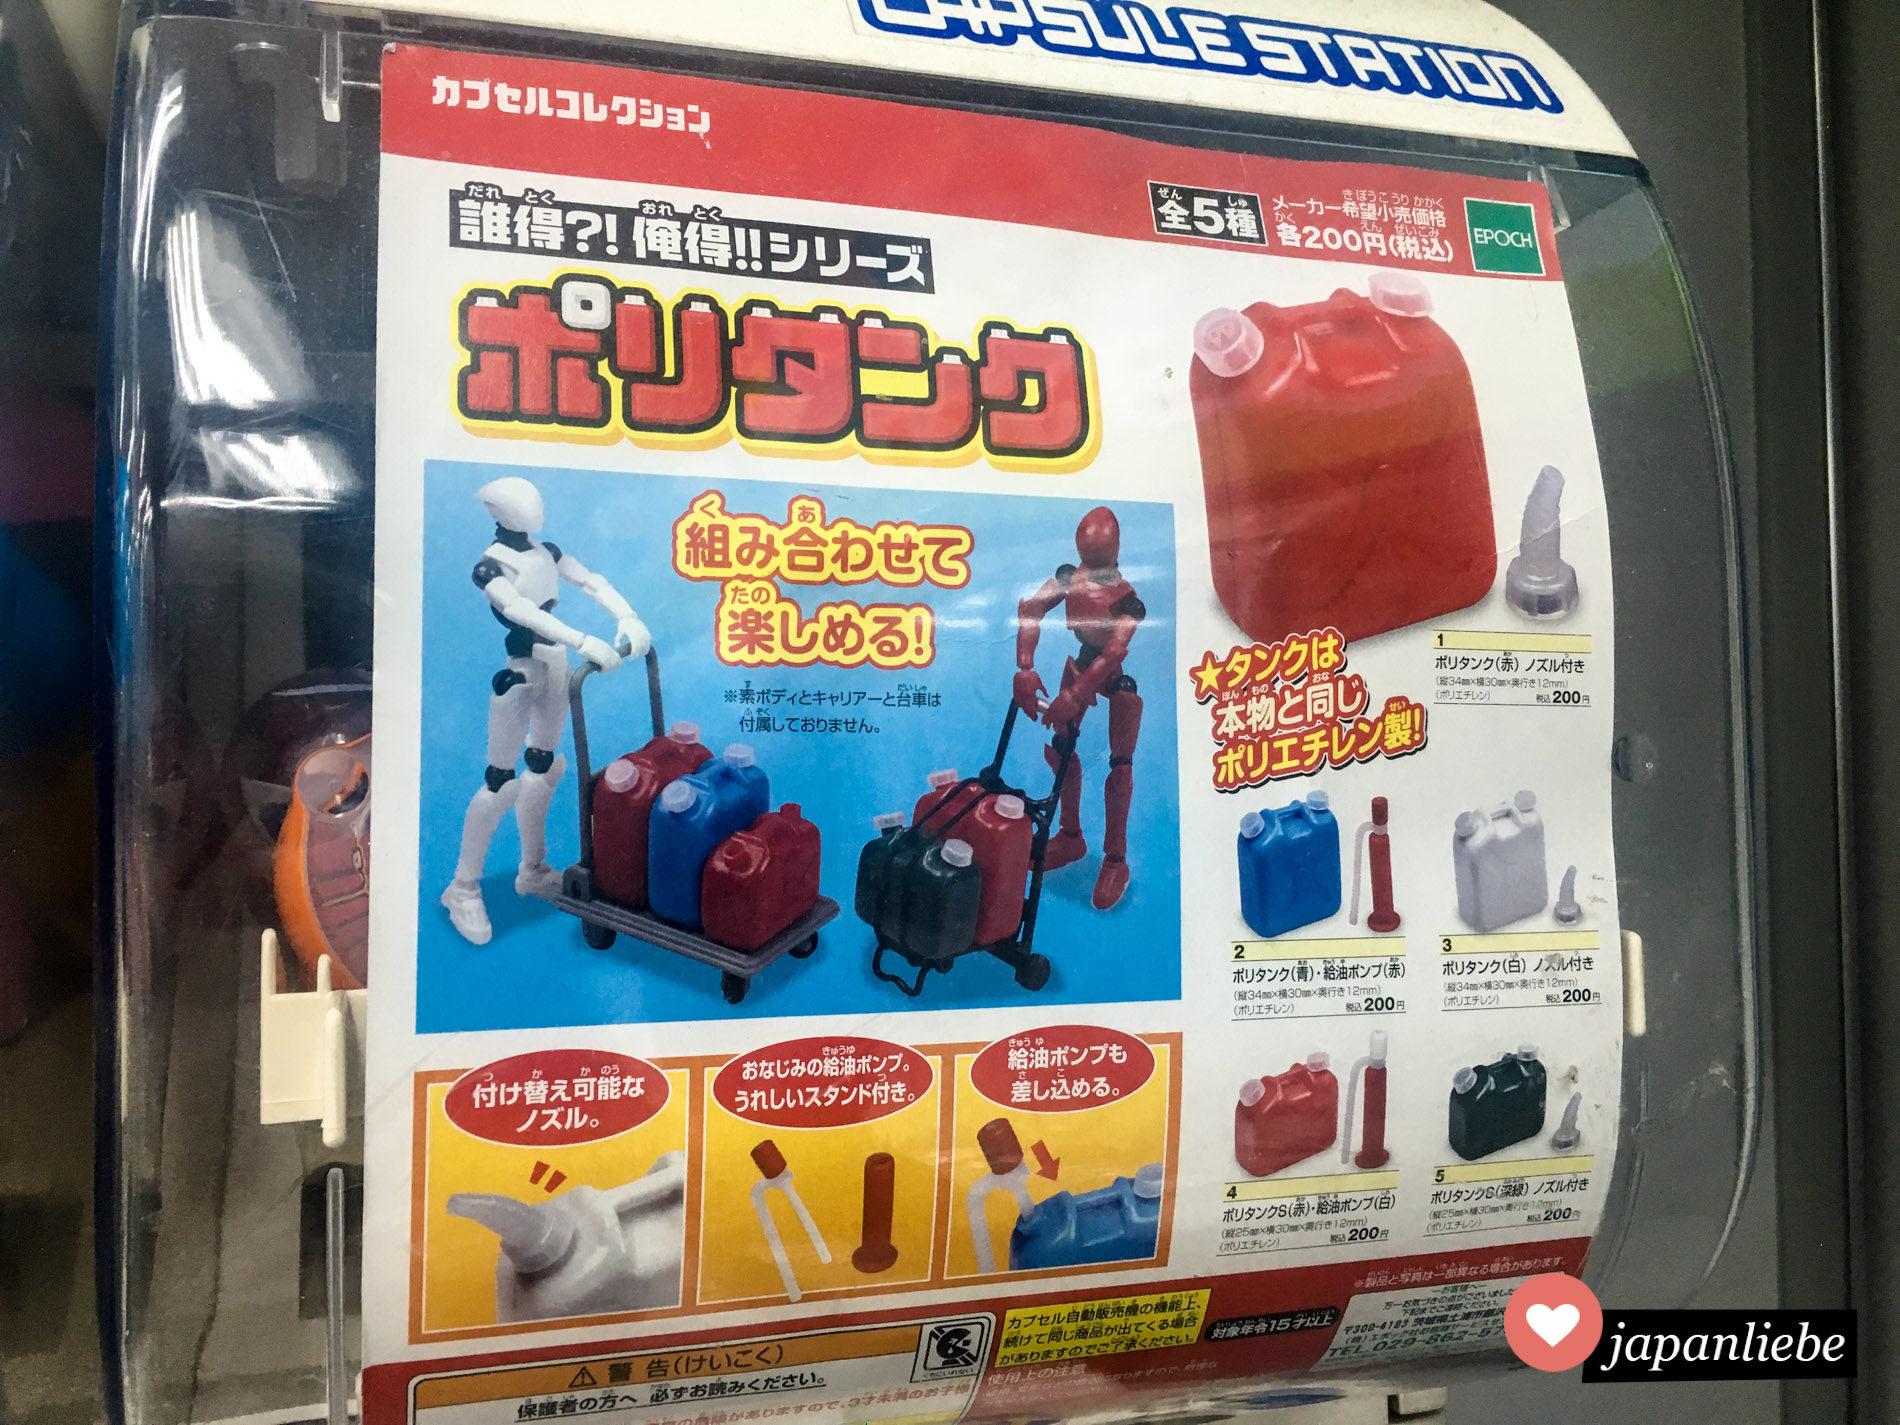 Gashapon: daretoku!? oretoku!! Benzinkanister